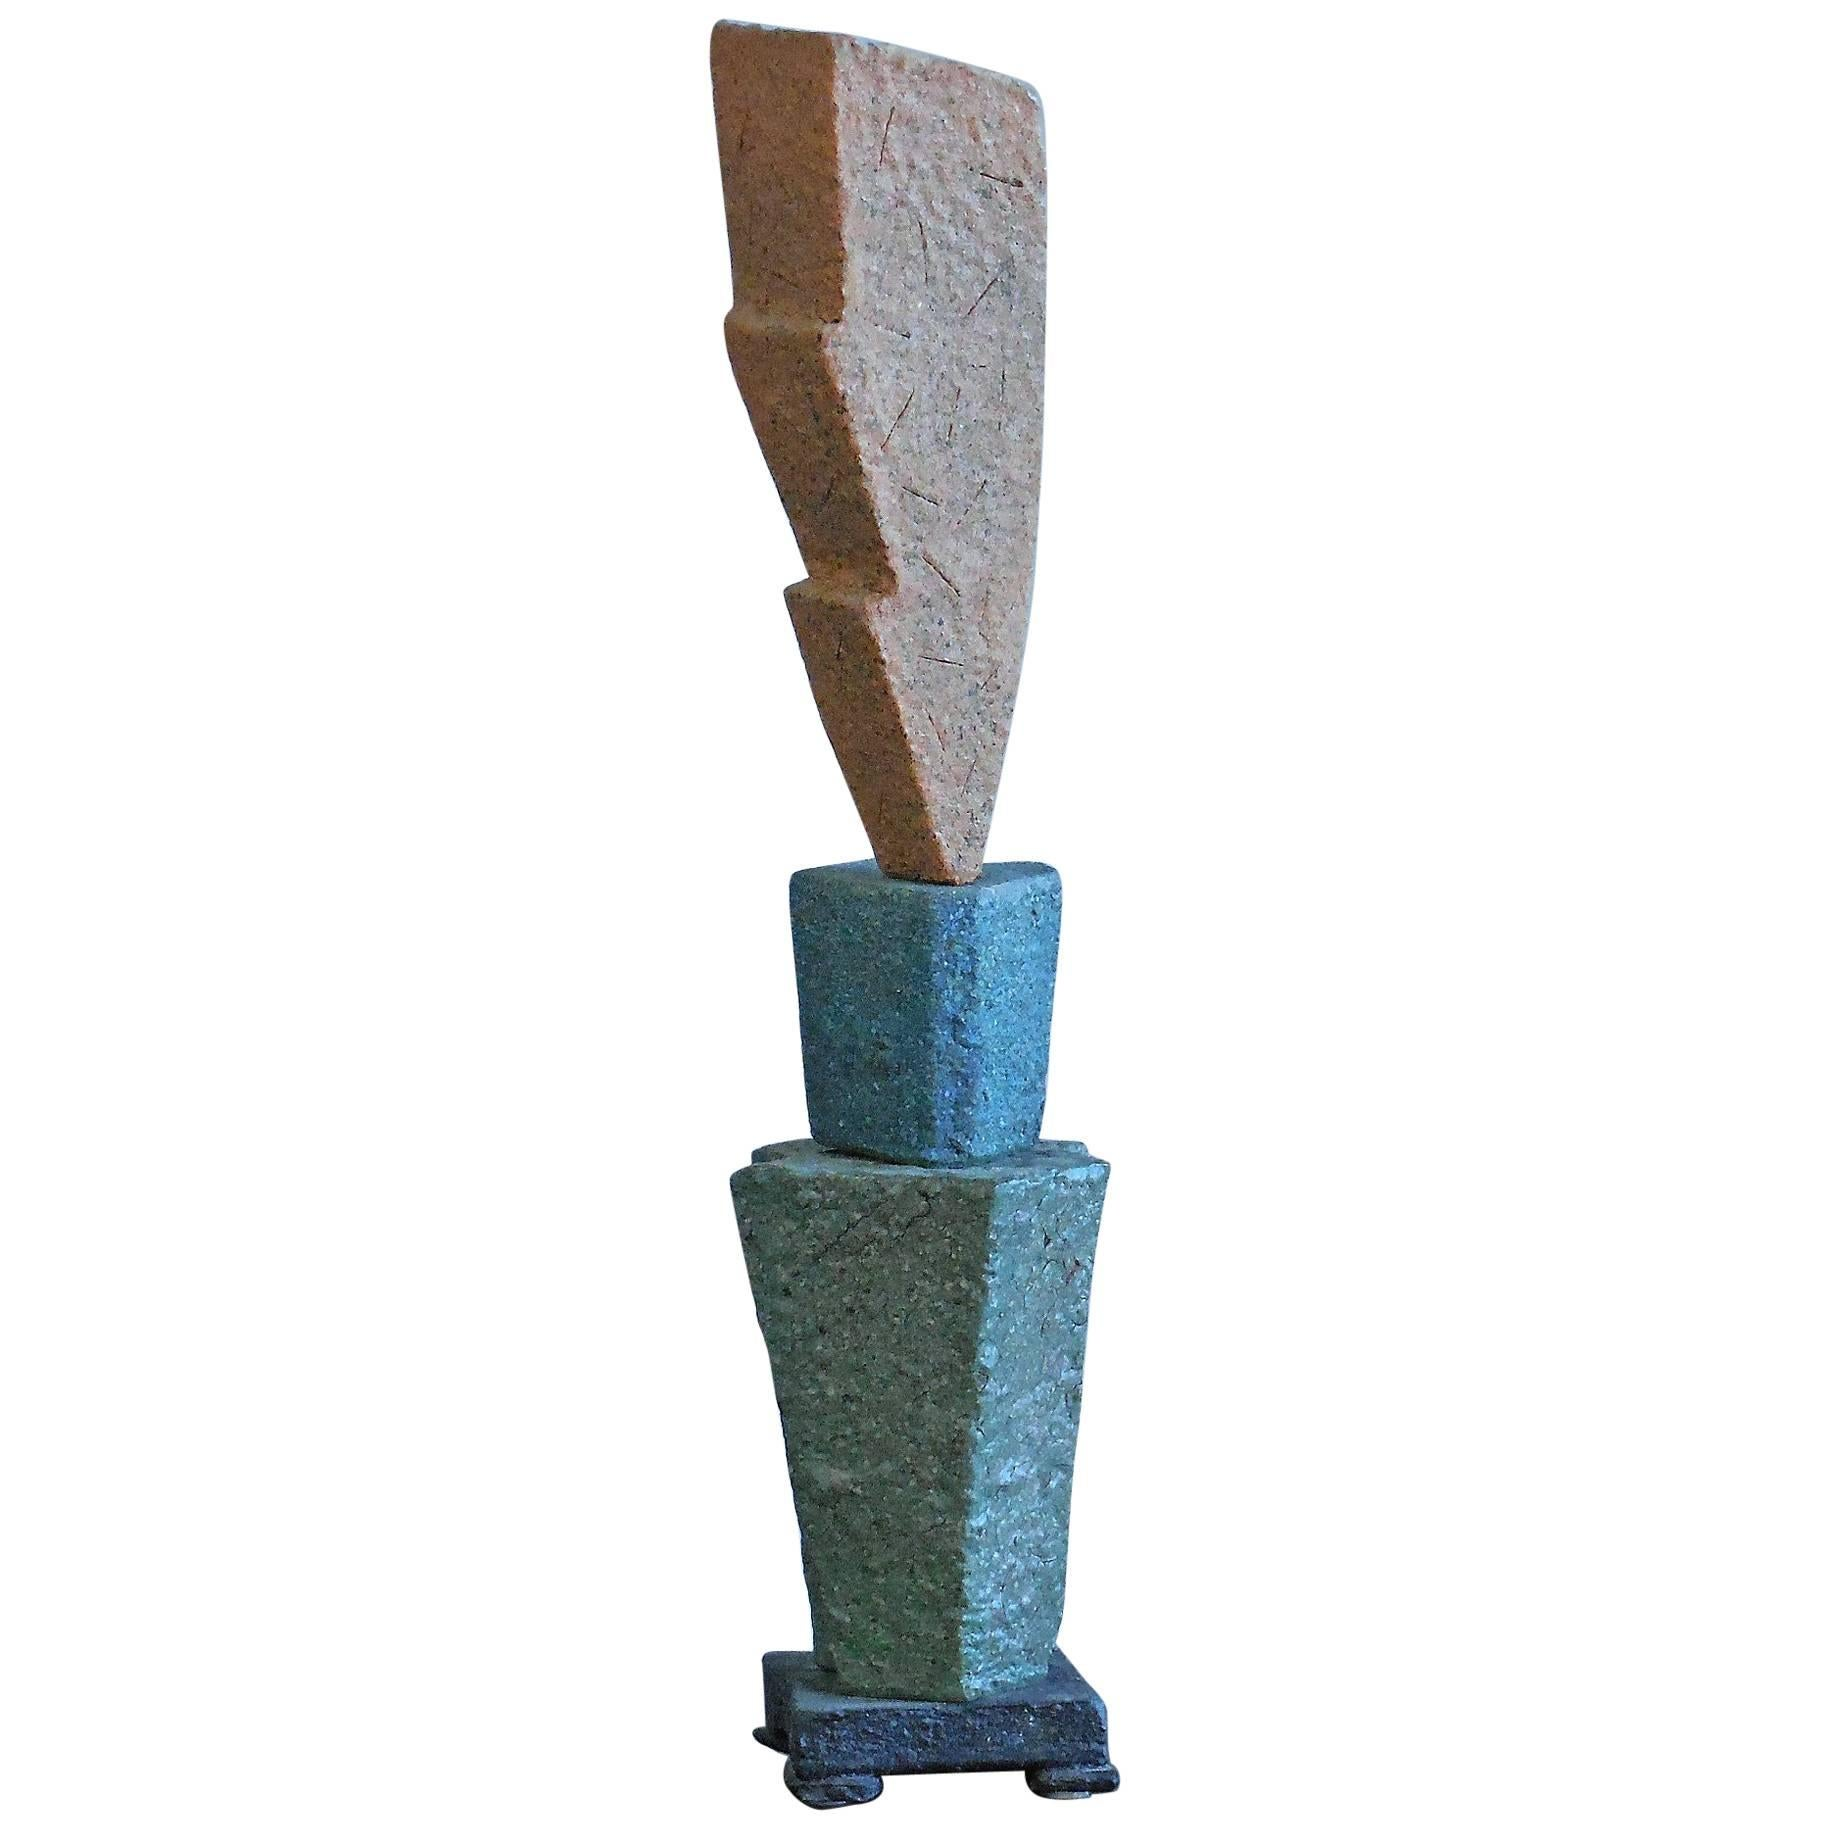 Sculptural Studio Pottery Ceramic Table Lamp, 1980s